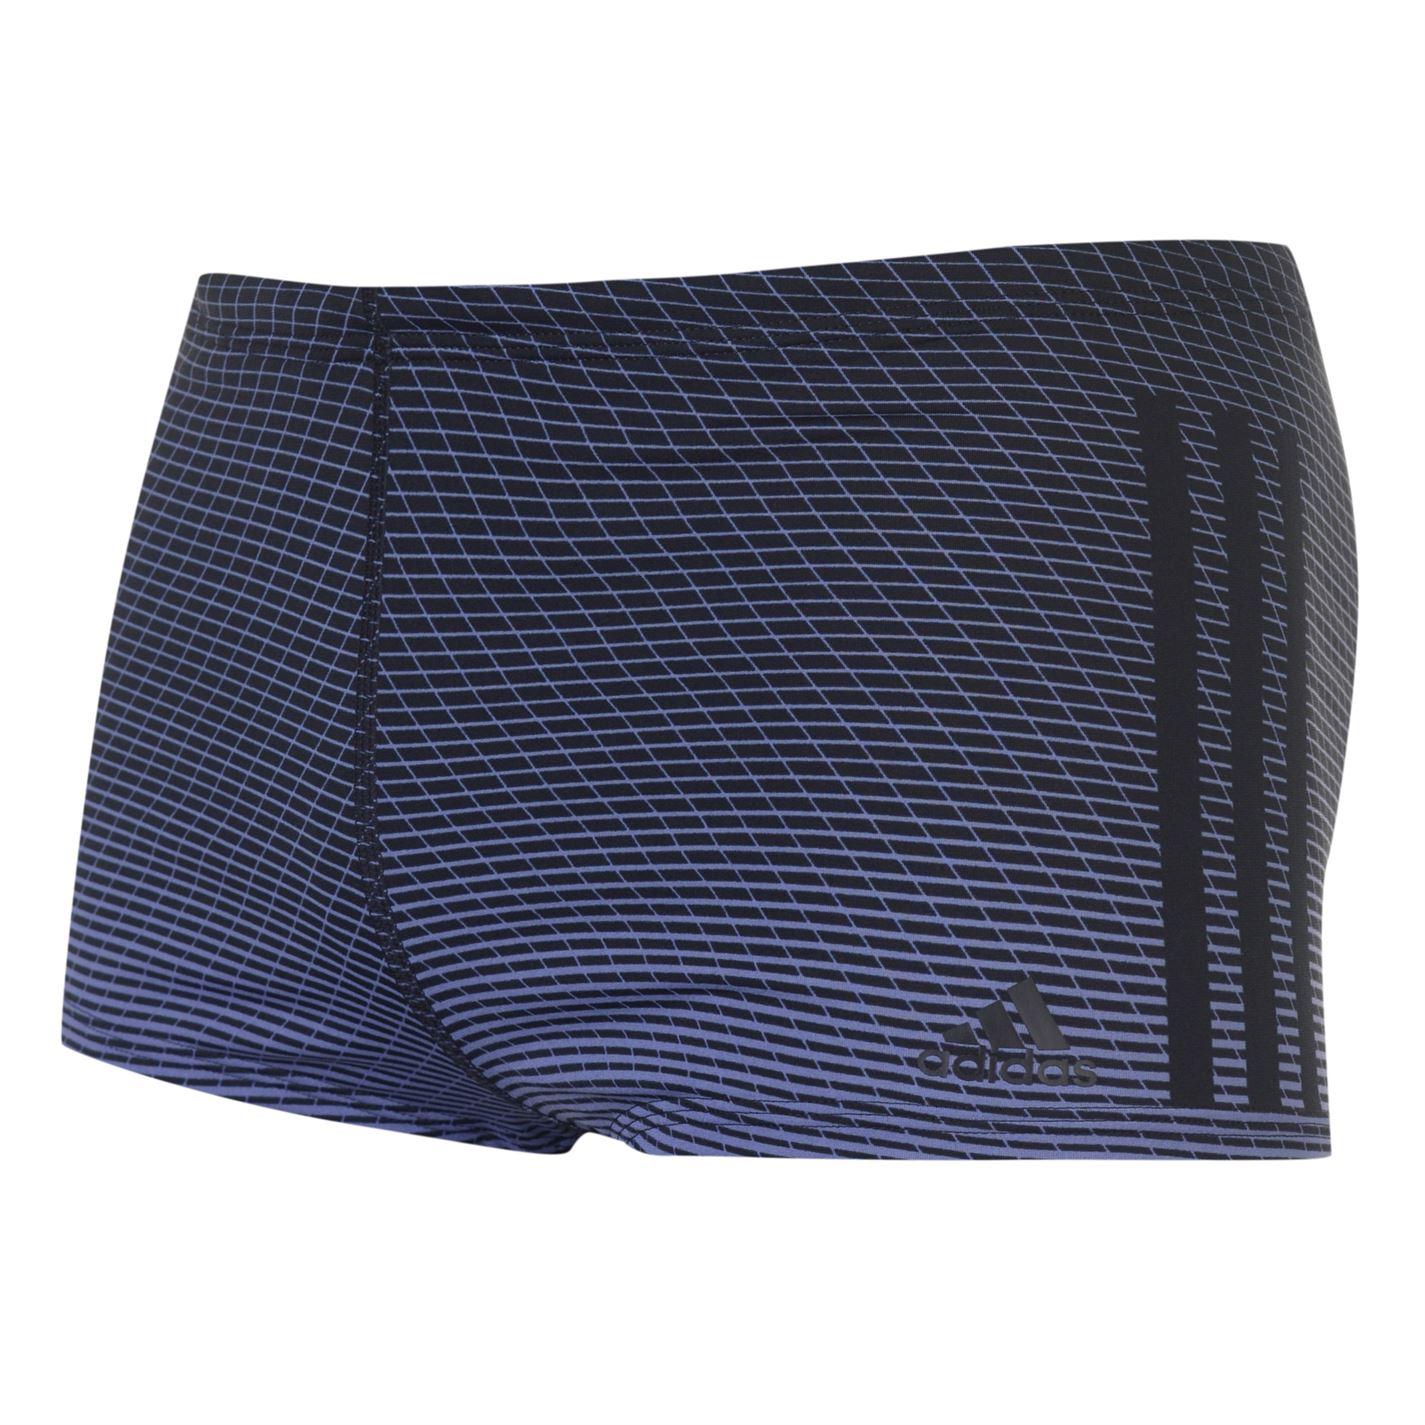 Adidas 3 Stripes Graphic Swim Boxers Mens